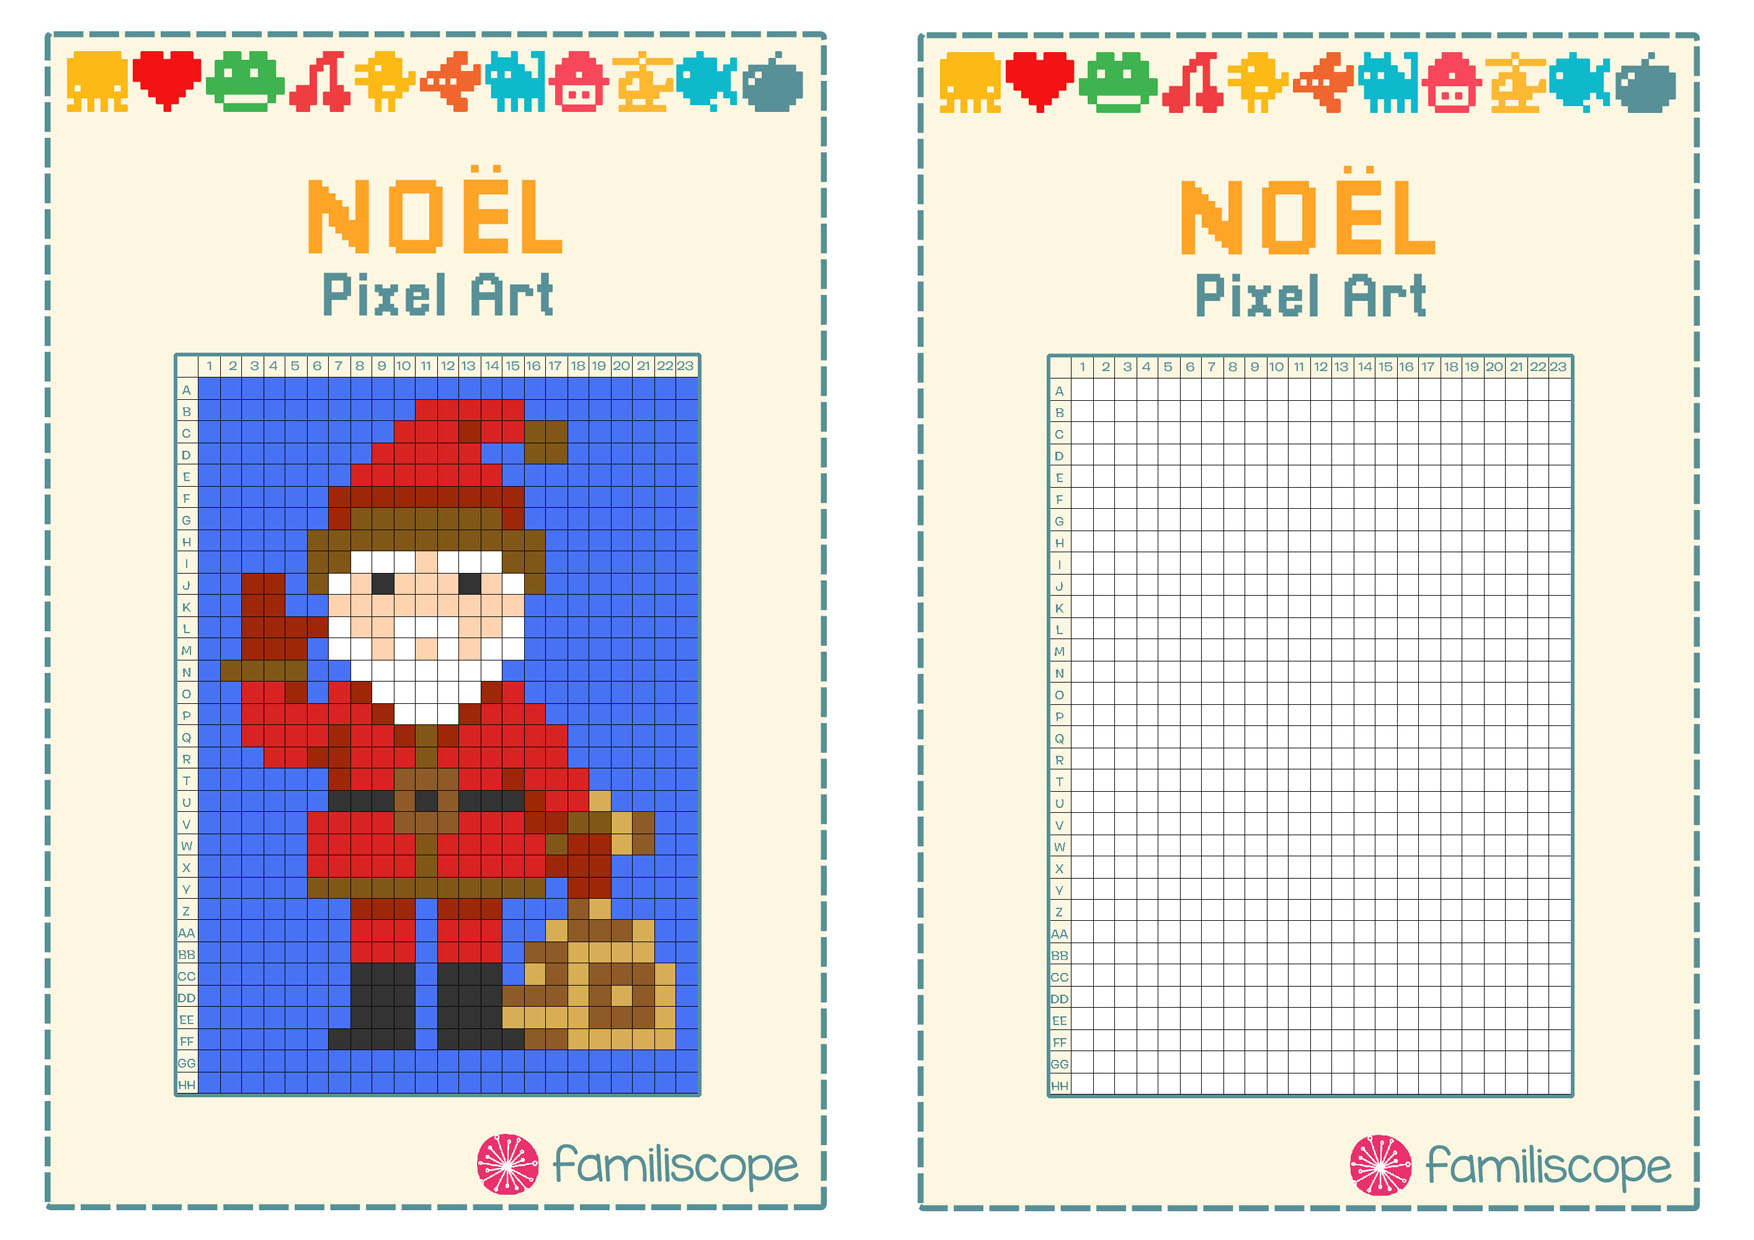 Pixel Art Noël : Père Noël destiné Pixel Art Pere Noel